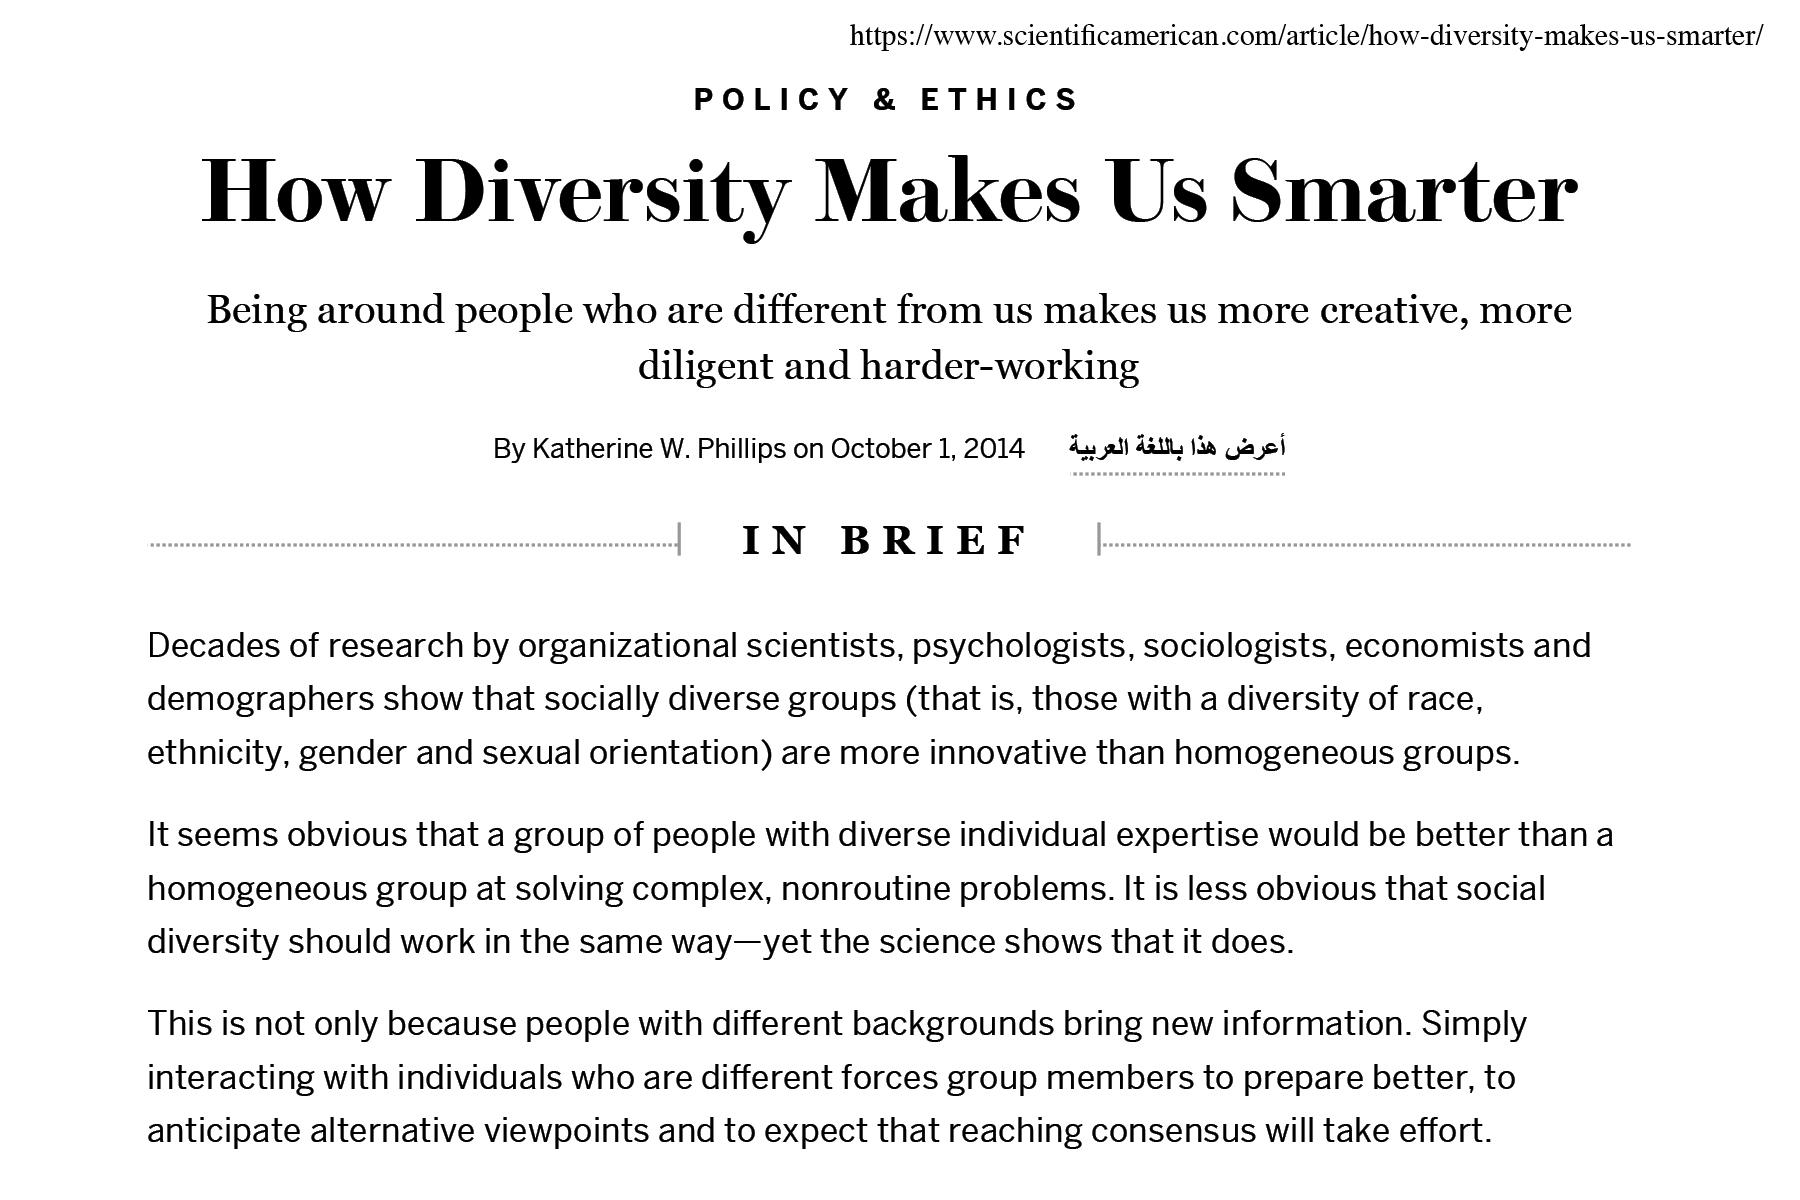 Diversity-business-case-smarter.jpg